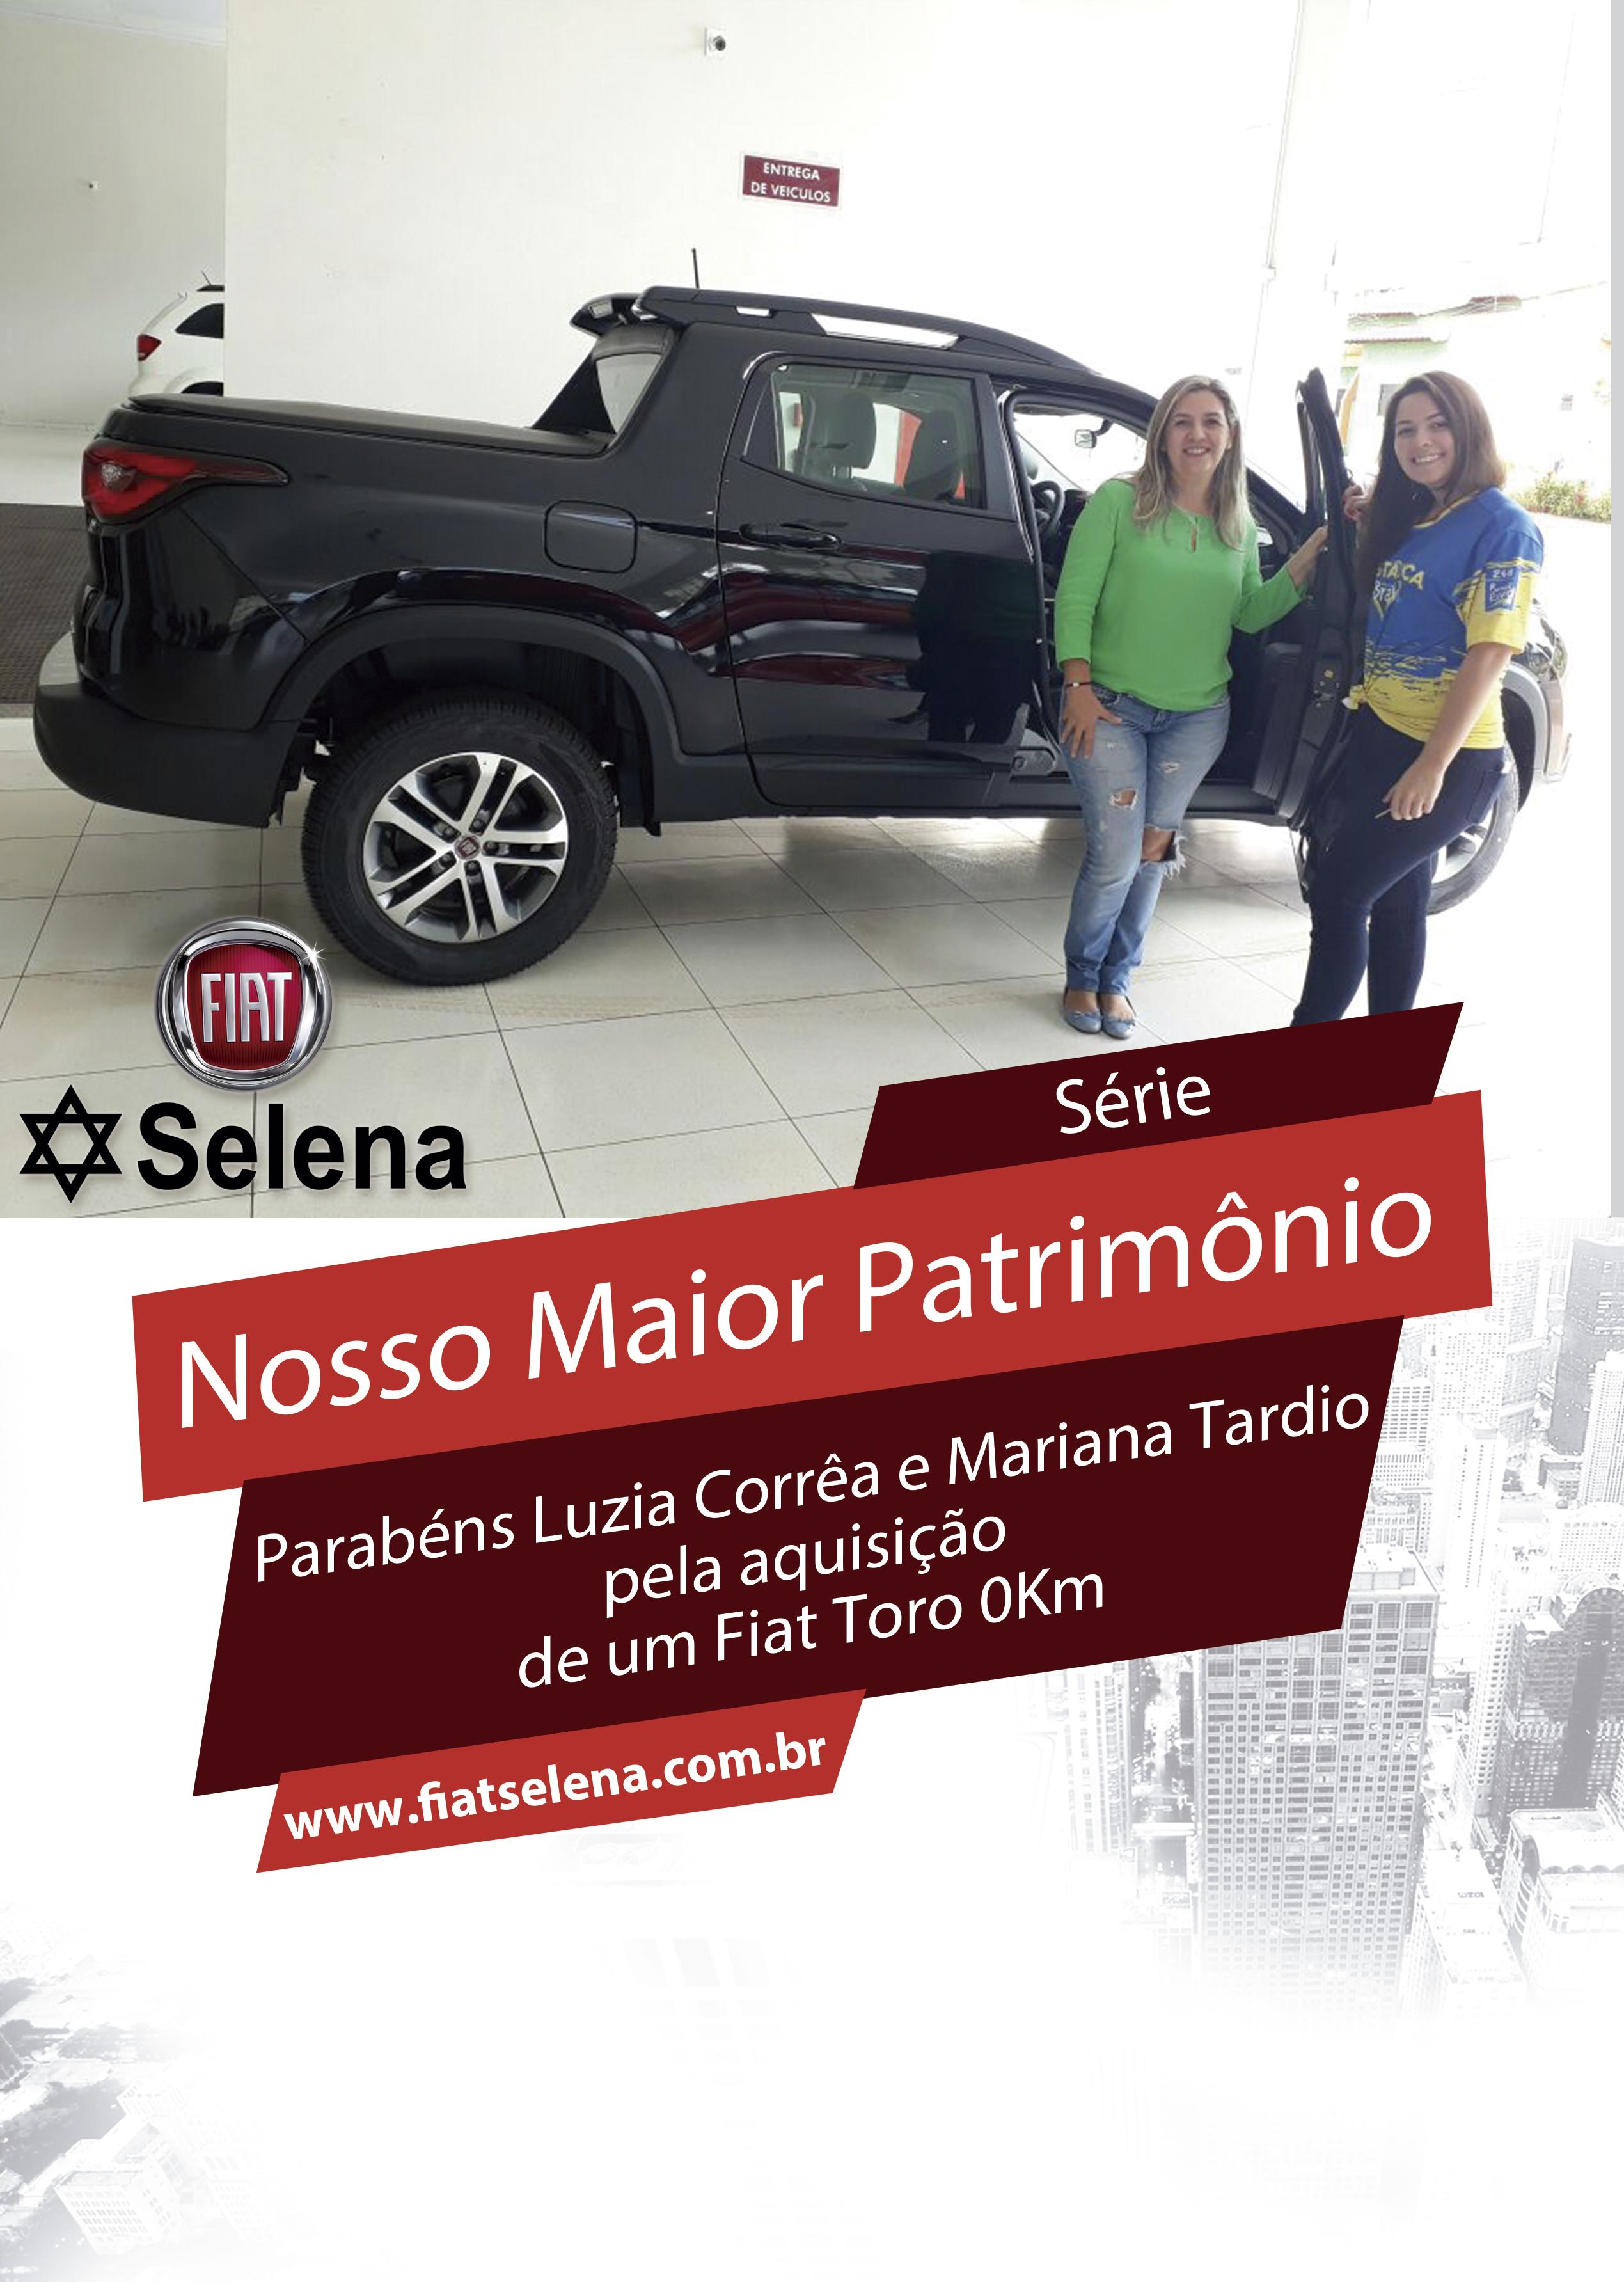 Luzia_Corrêa_e_Mariana_Tardio_png_insta